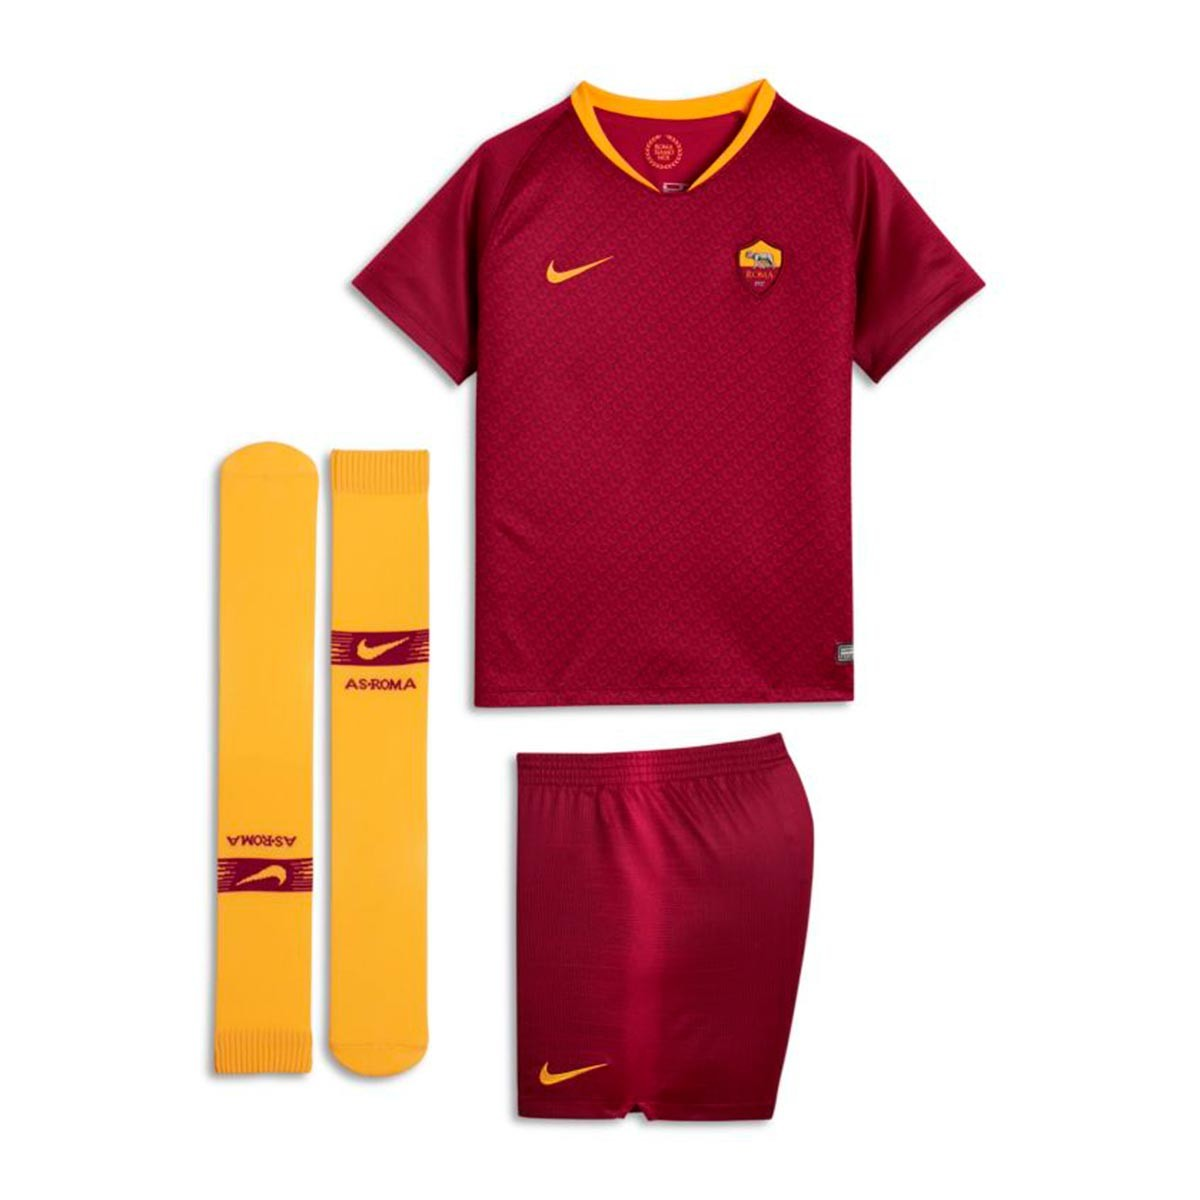 0012c50afbff Kit Nike Kids AS Roma 2018-2019 Home Team red-University gold ...